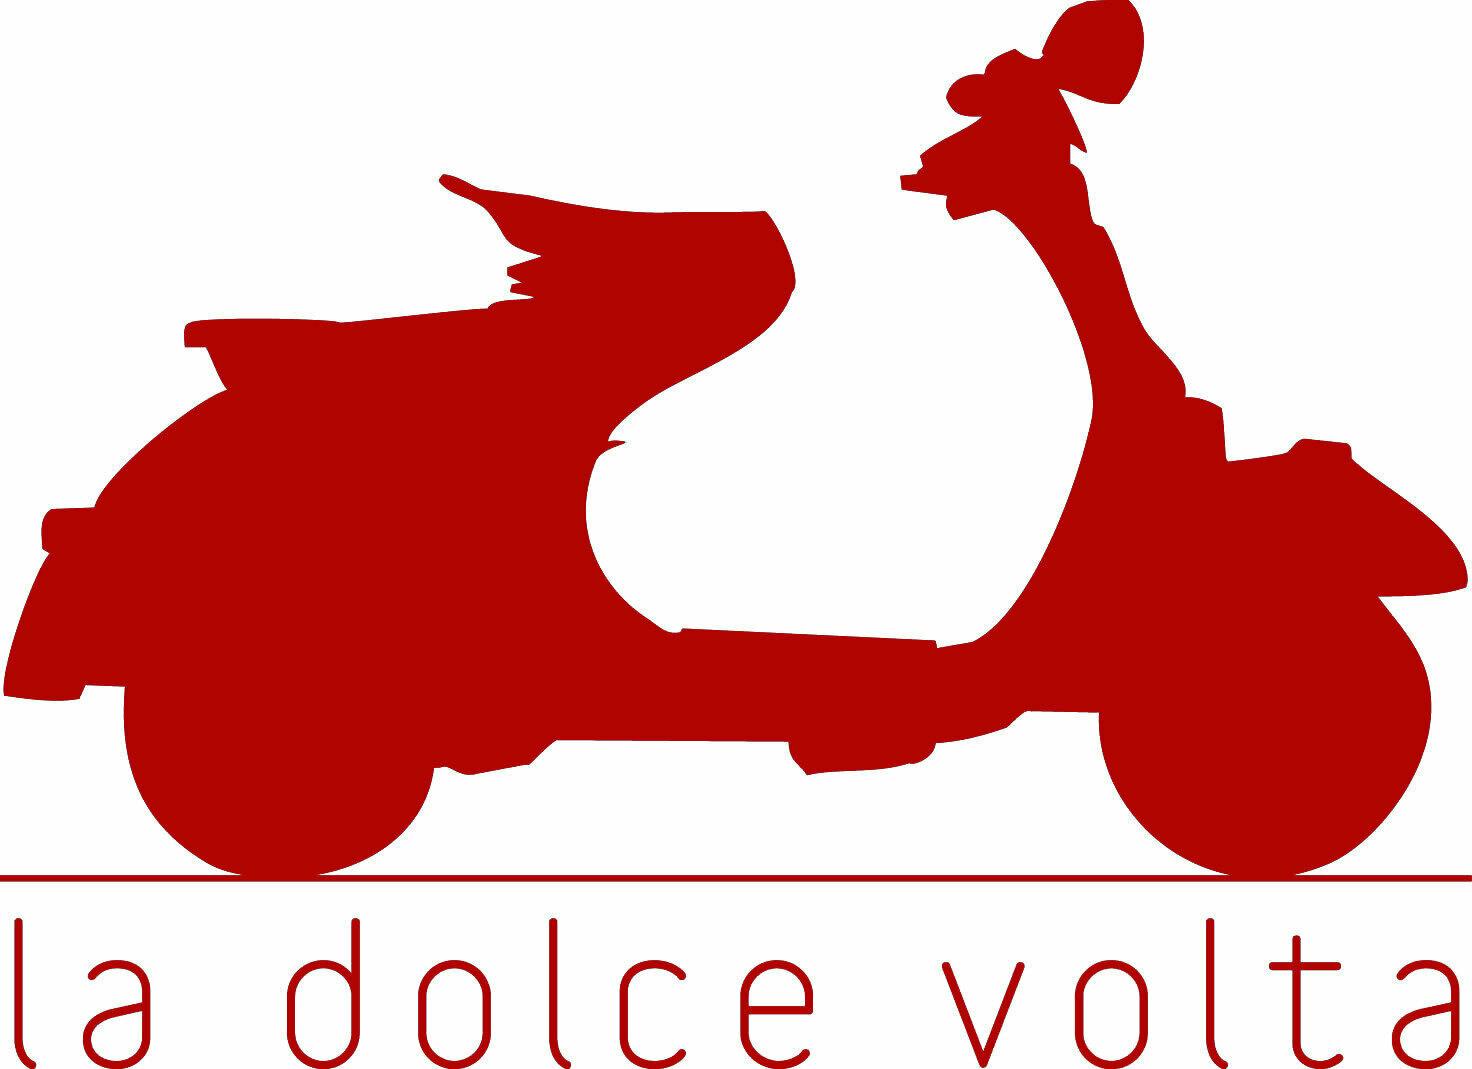 LOGO_LA_DOLCE_VOLTA_2011_HD_blue 2